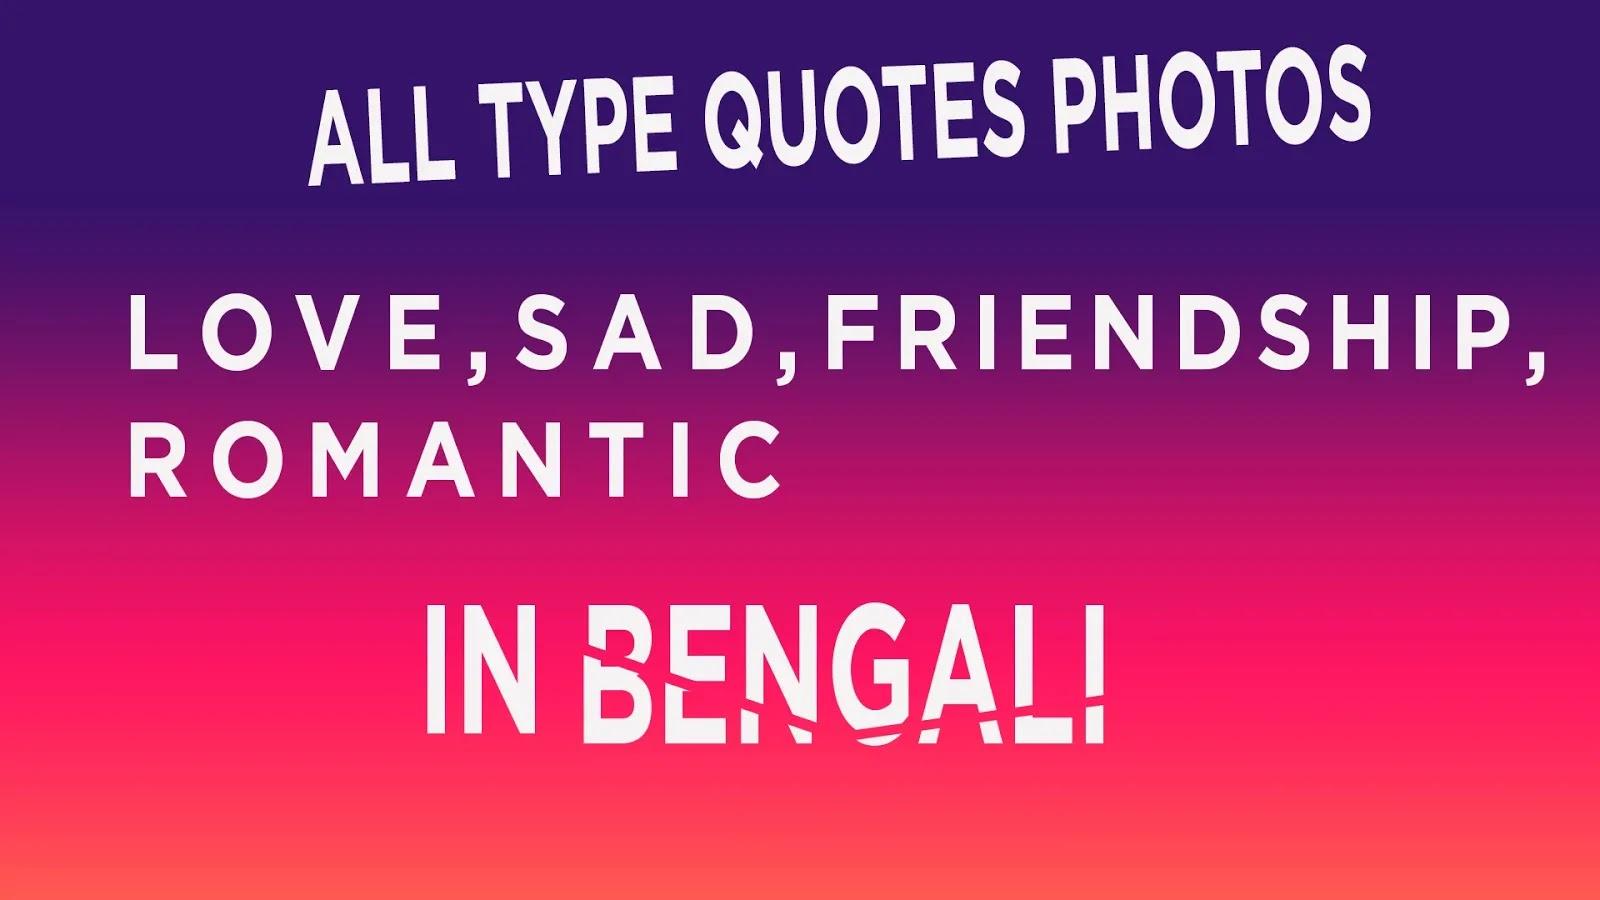 Quotes All Types Photos Love, Sad, Friendship, Romantic In Bengali